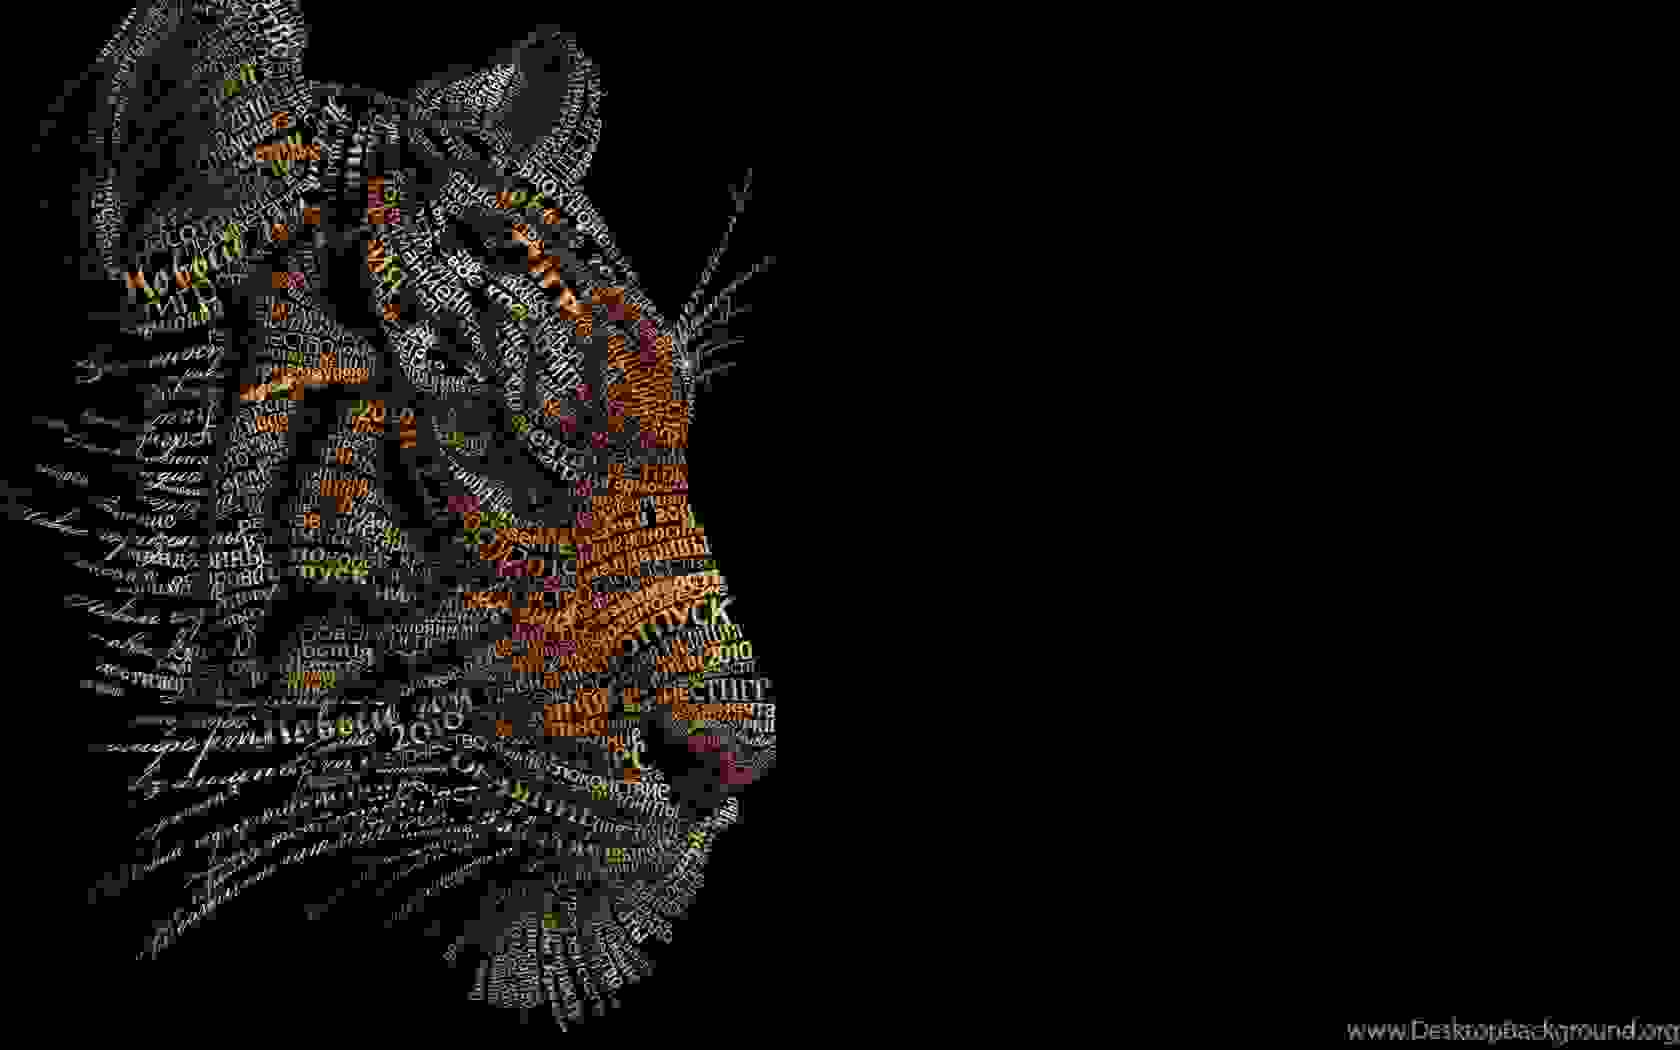 Typography Digital Art | Source: desktopbackground.org